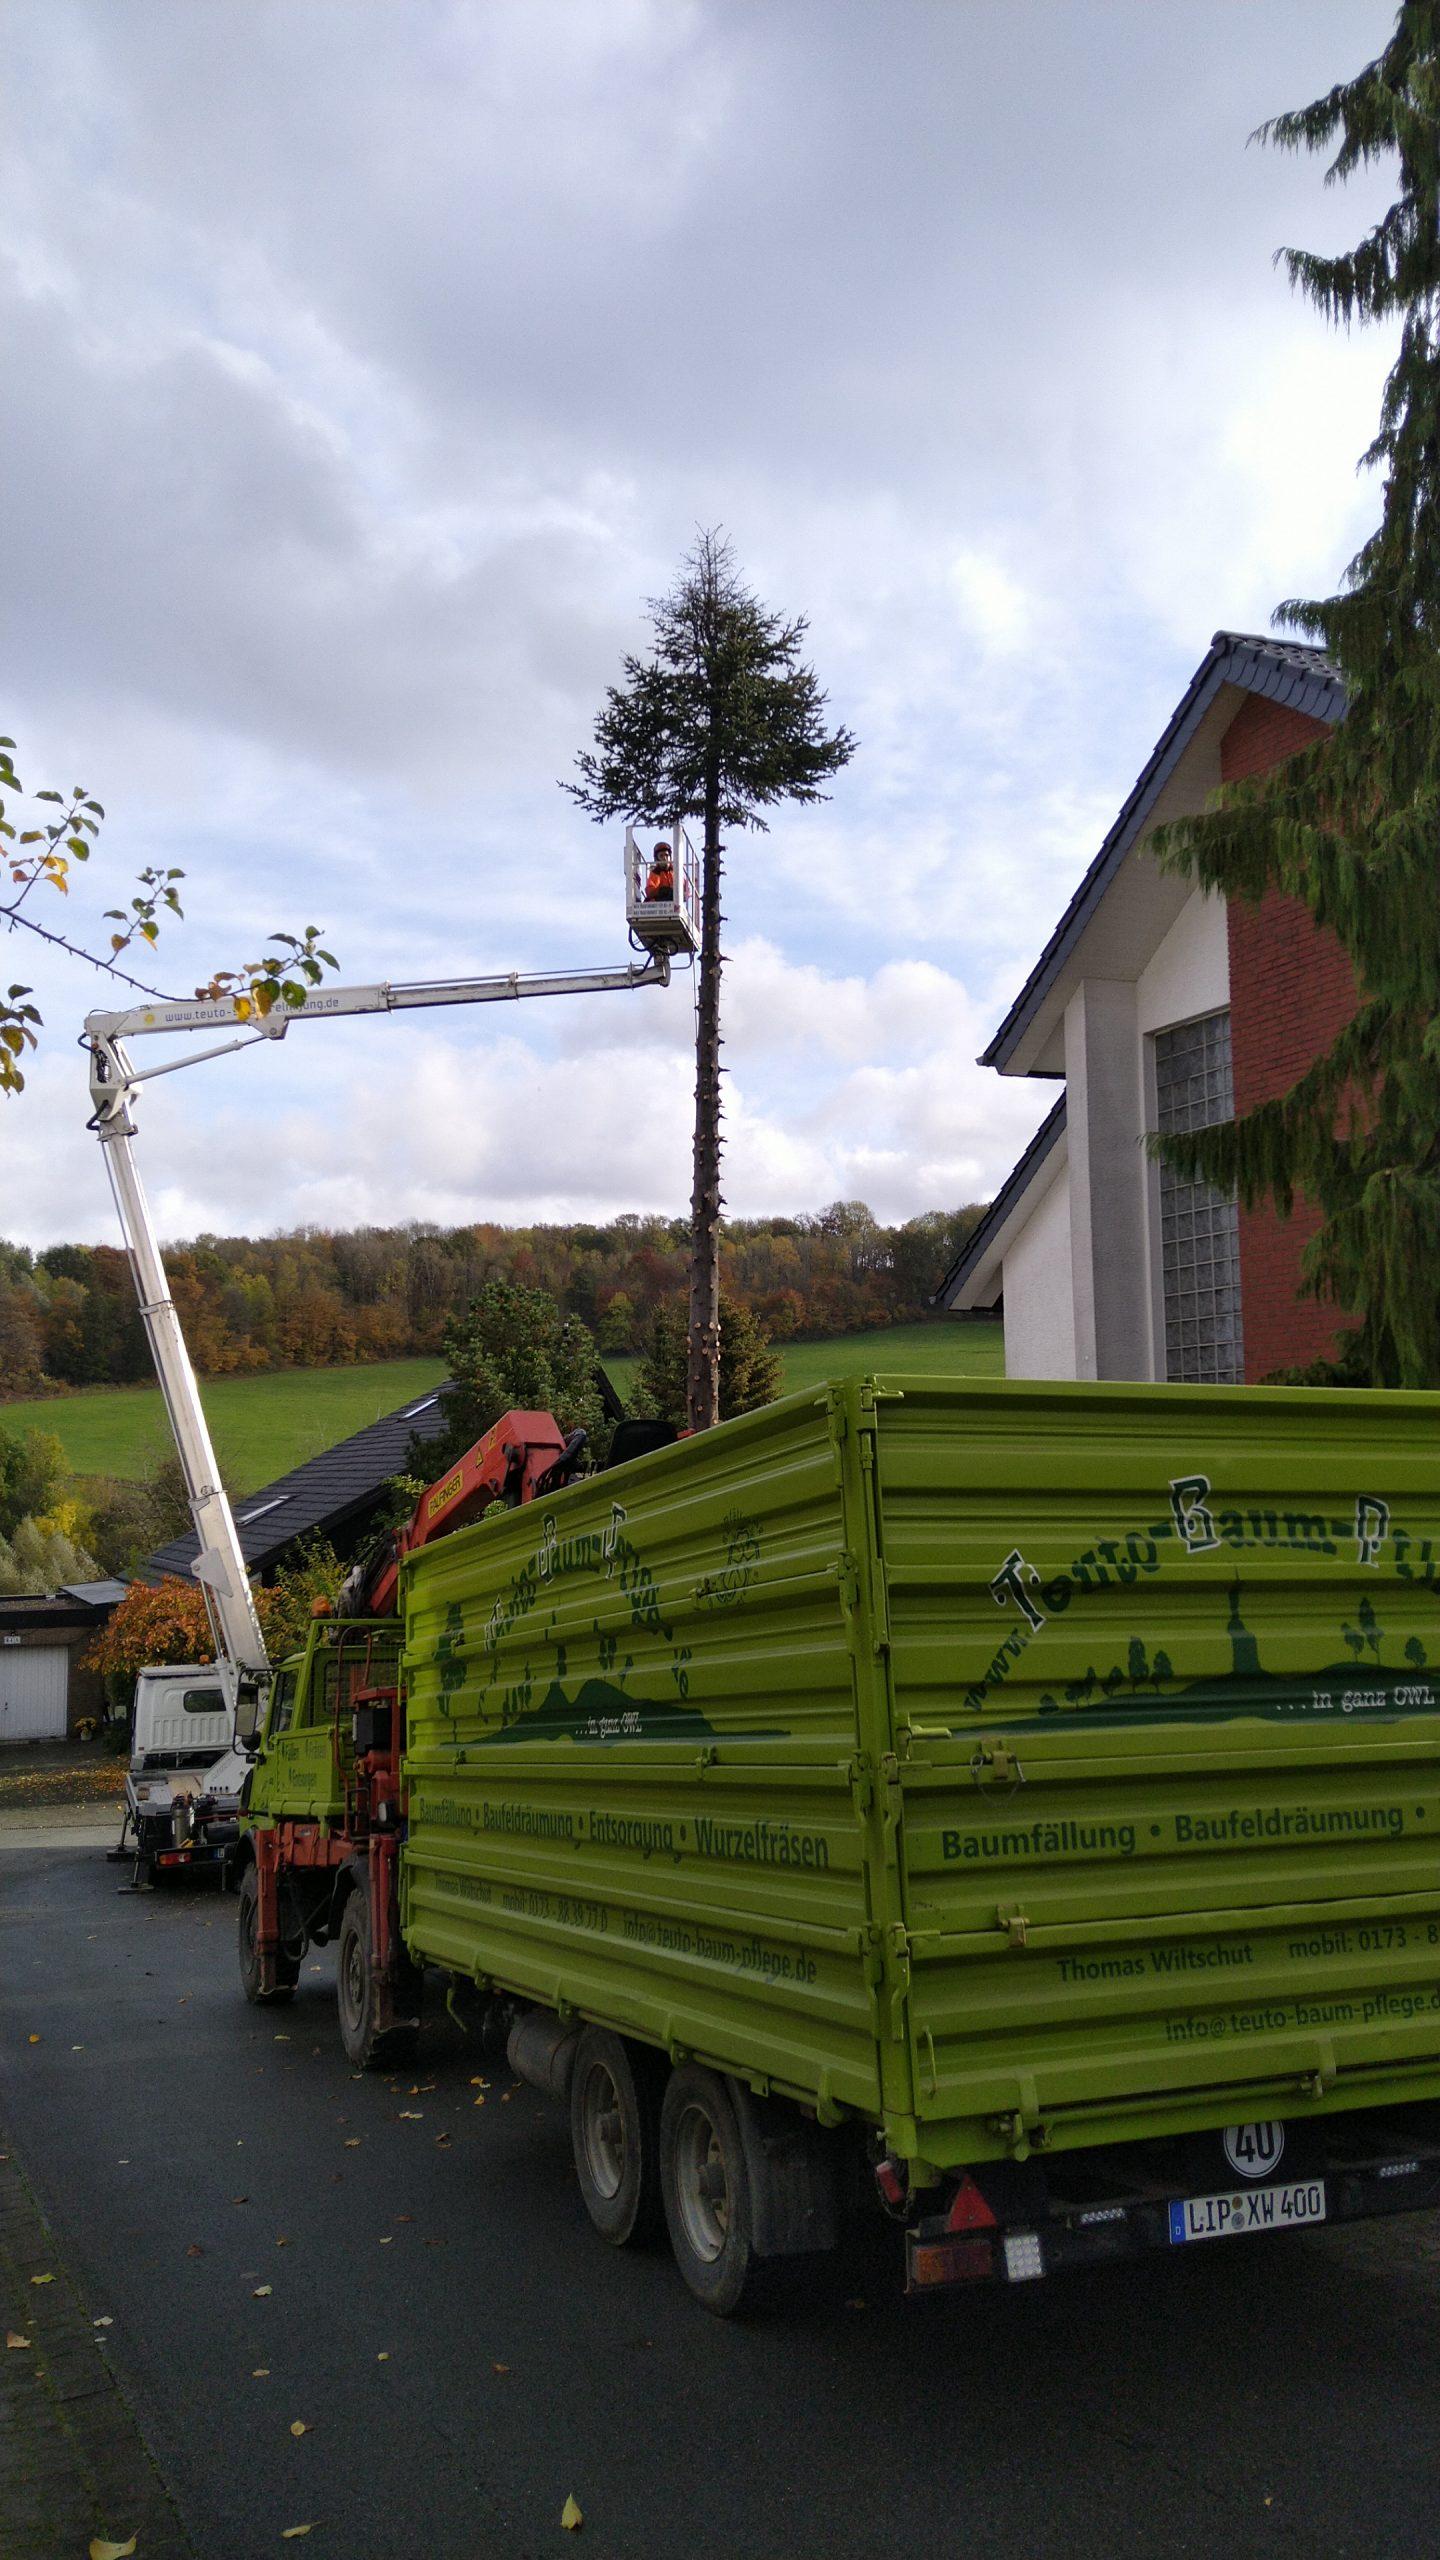 Baumarbeiten skl Detmold